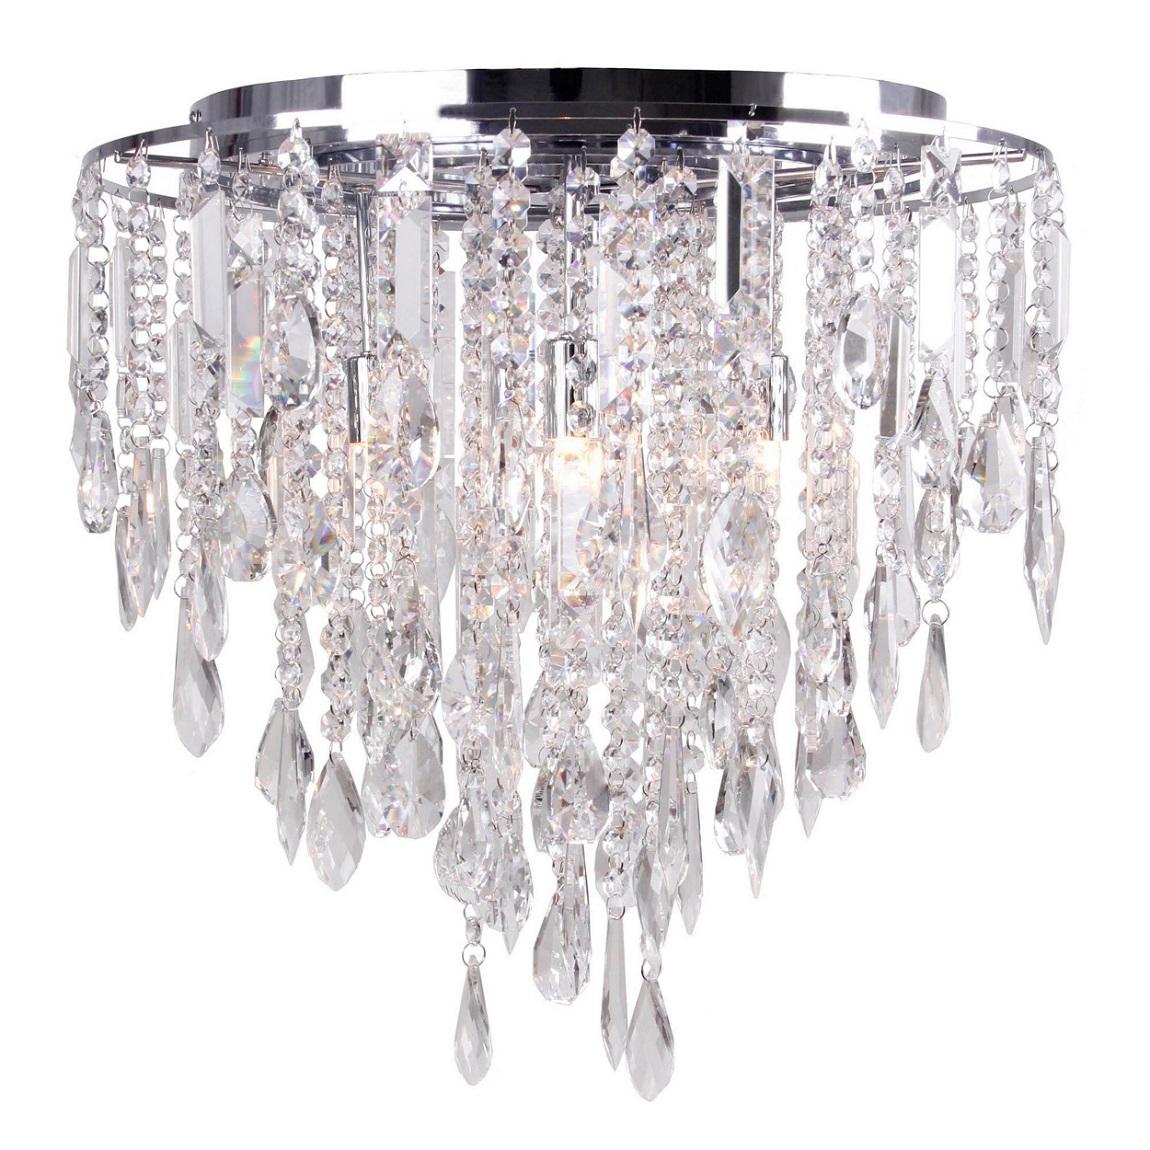 Debenhams Home Collection Lily Flush Ceiling Light